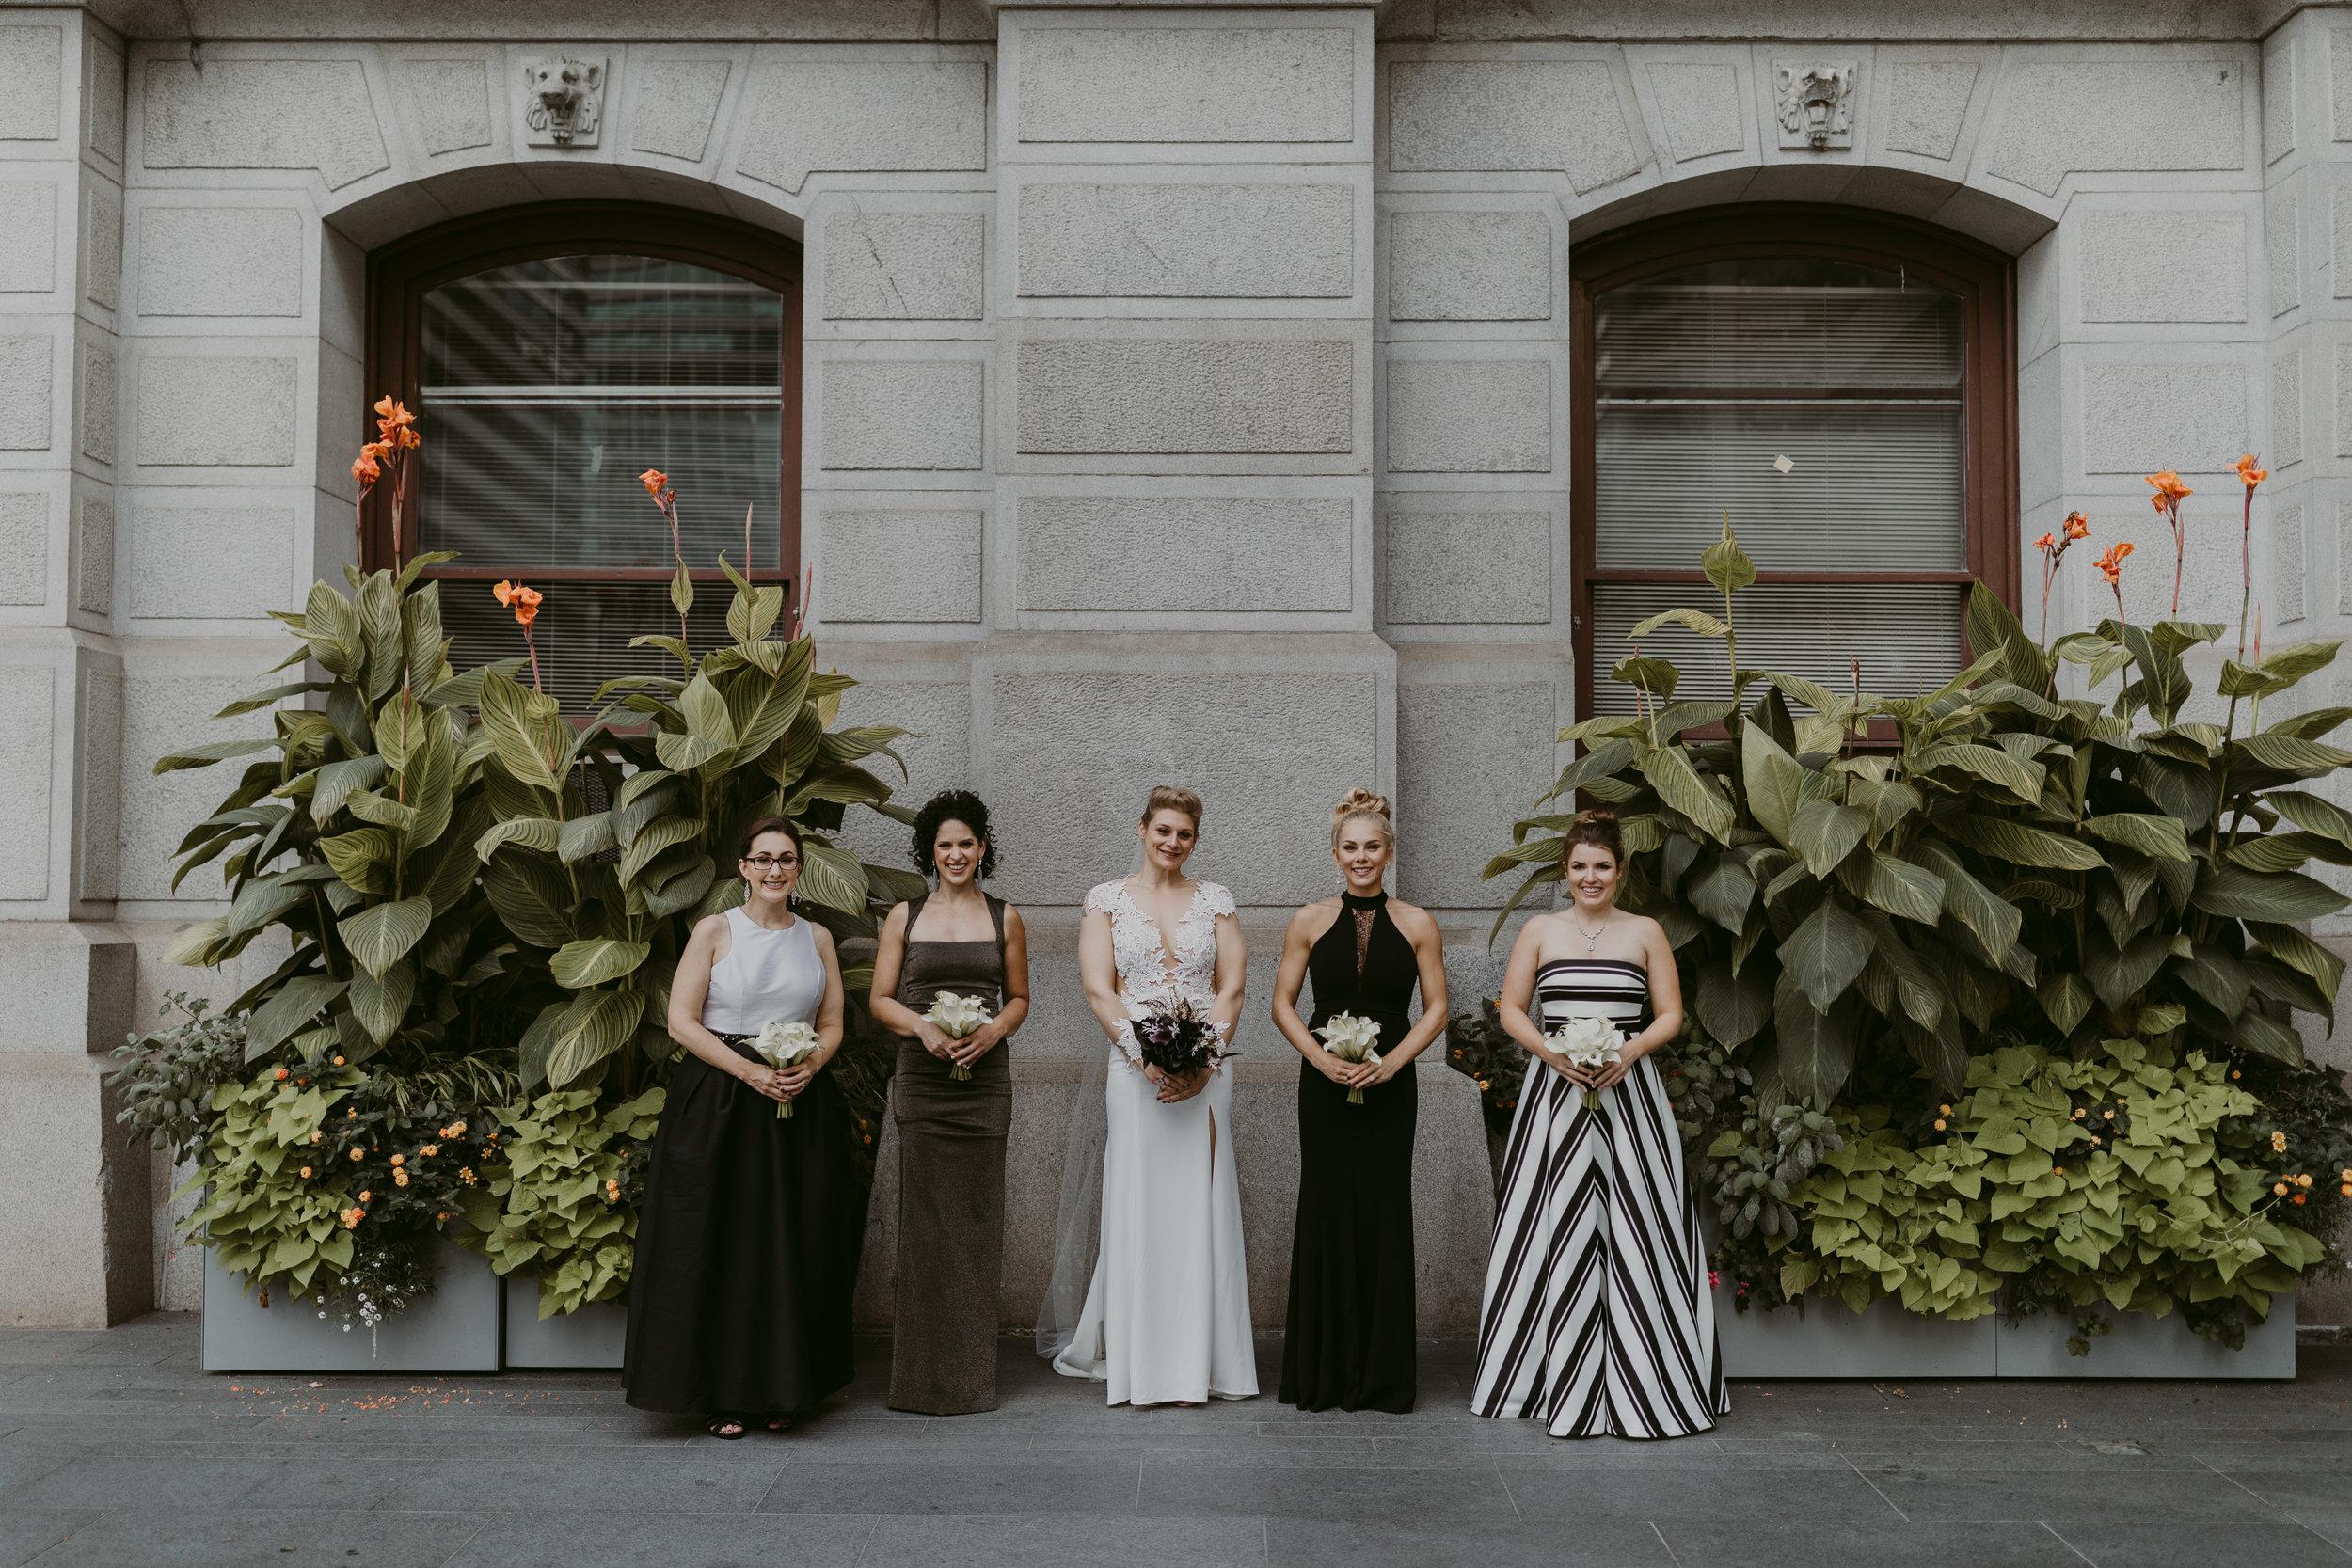 JessicaandRussell-OctoberWedding2017-3(69of162).jpg